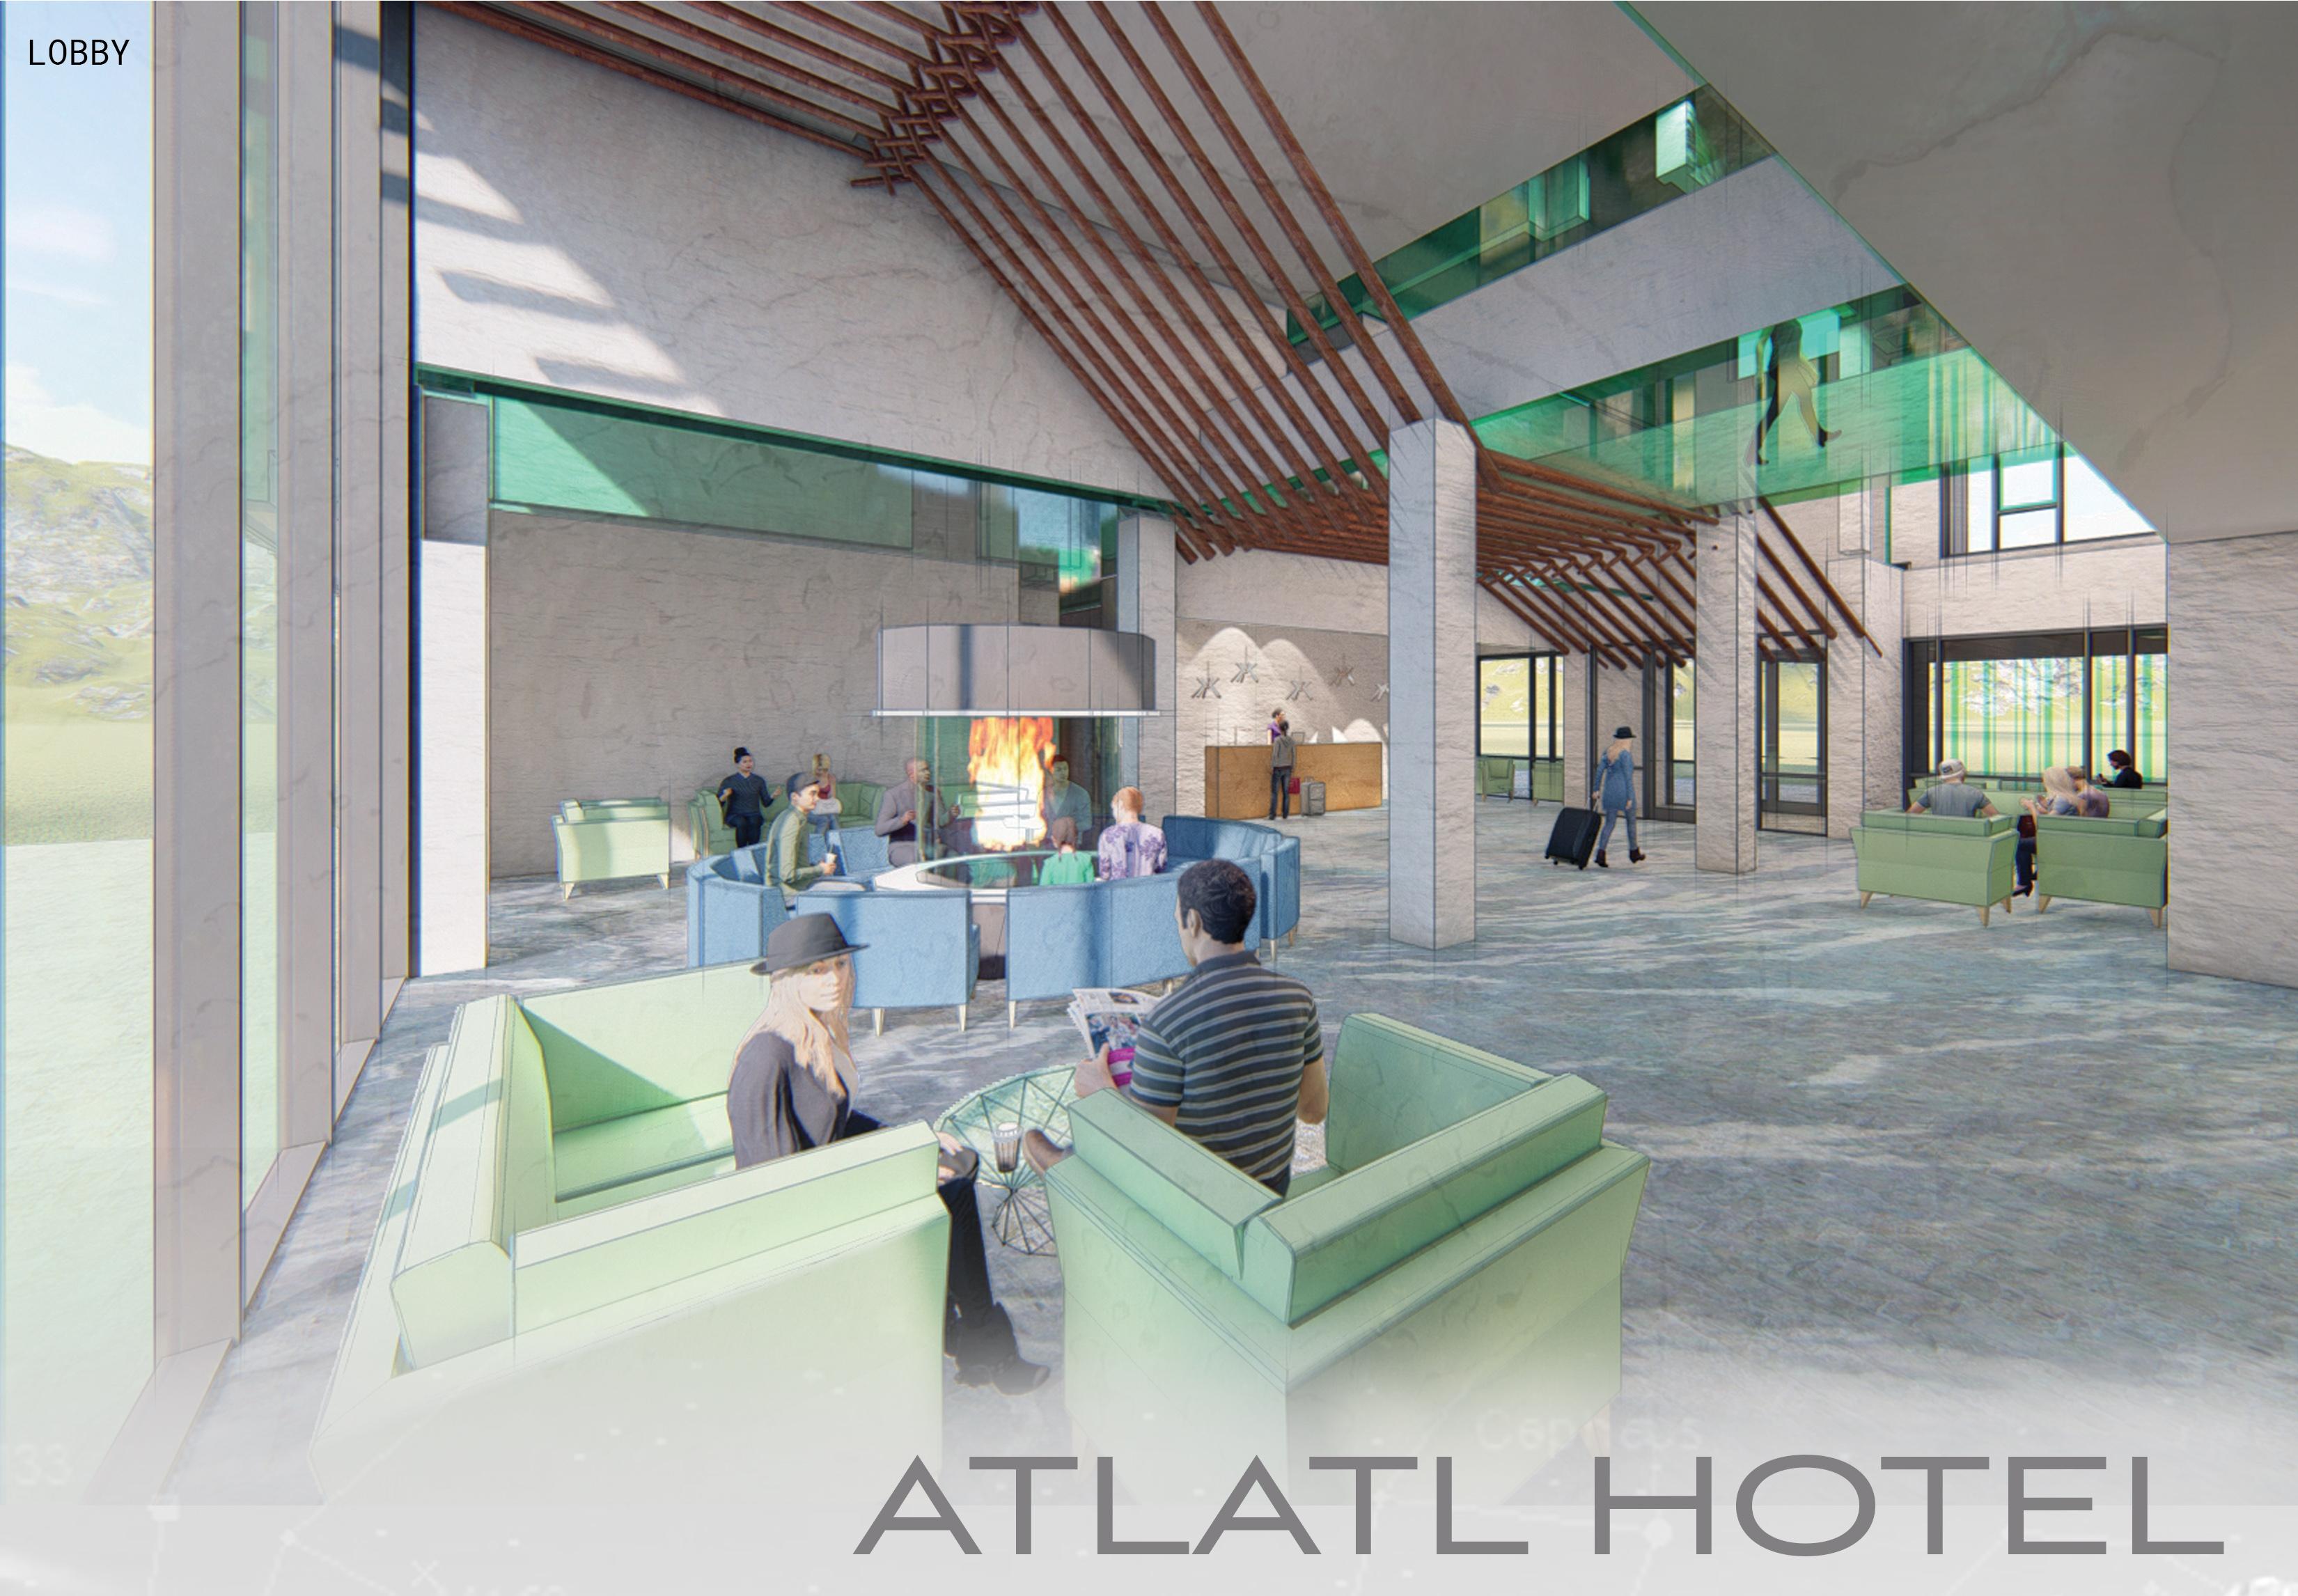 Atlatl Lobby Perspective